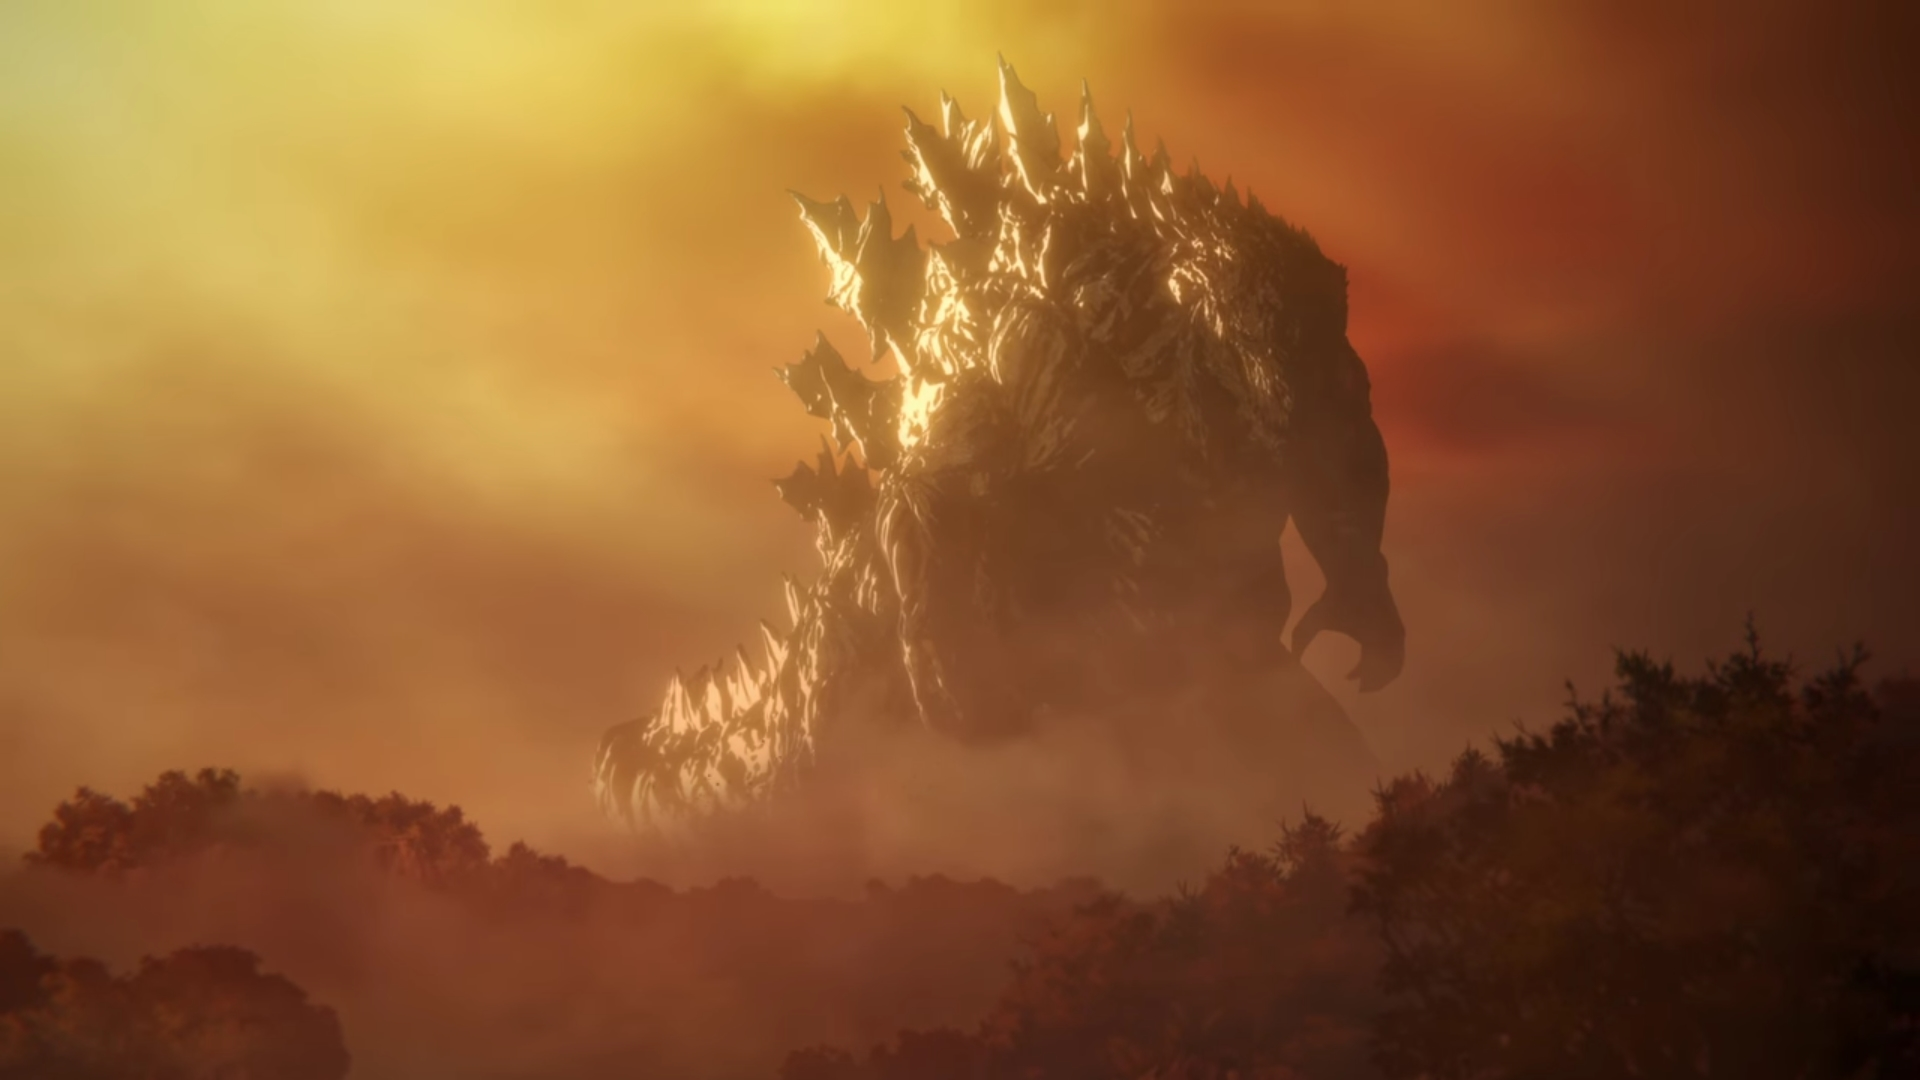 Godzilla ô roi de la destruction